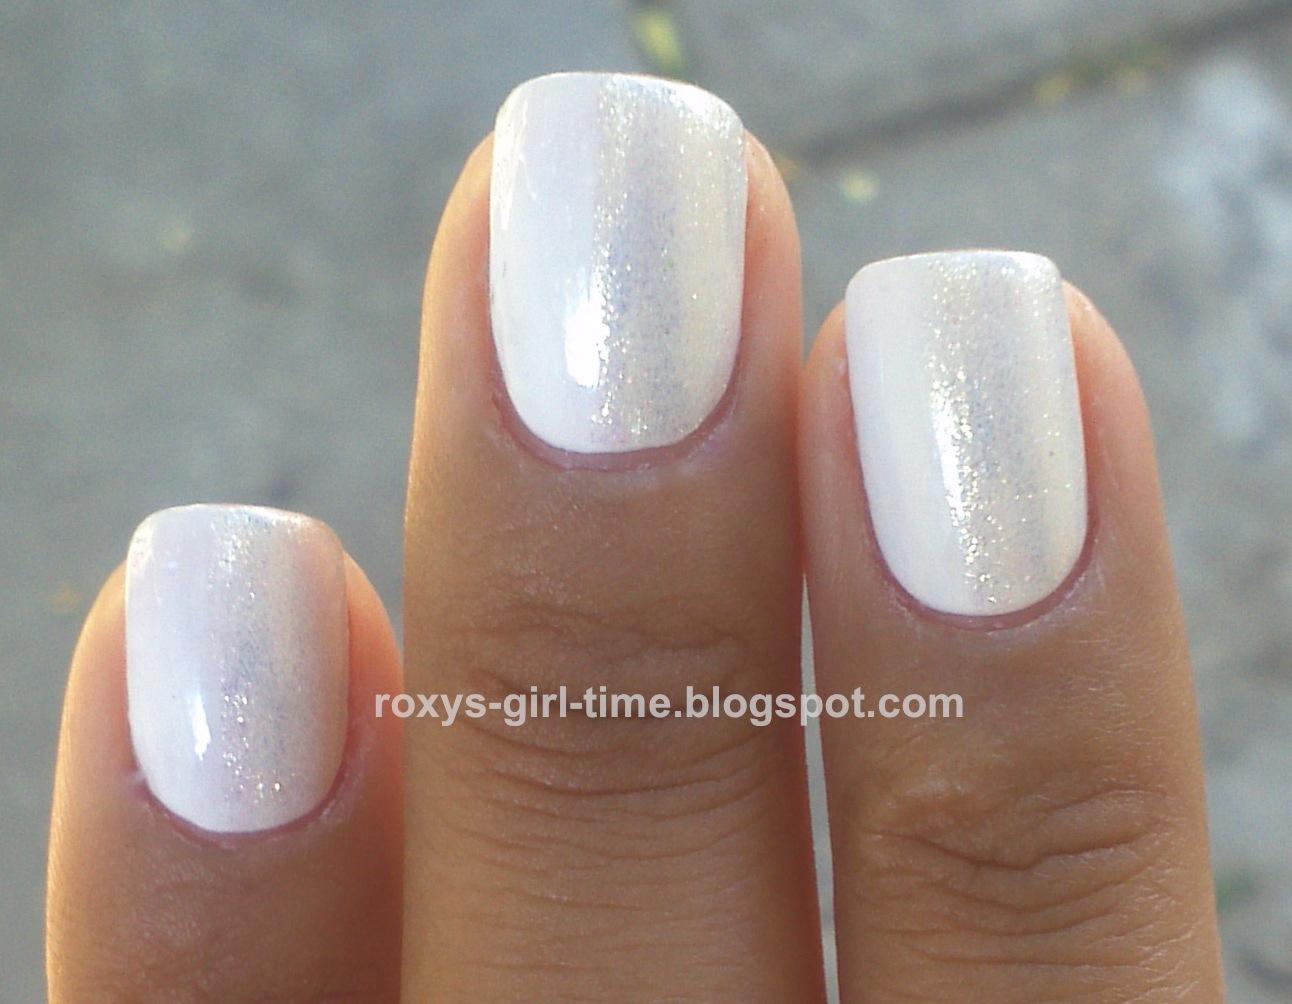 roxy's girl time: notd: china glaze white on white + snow cap